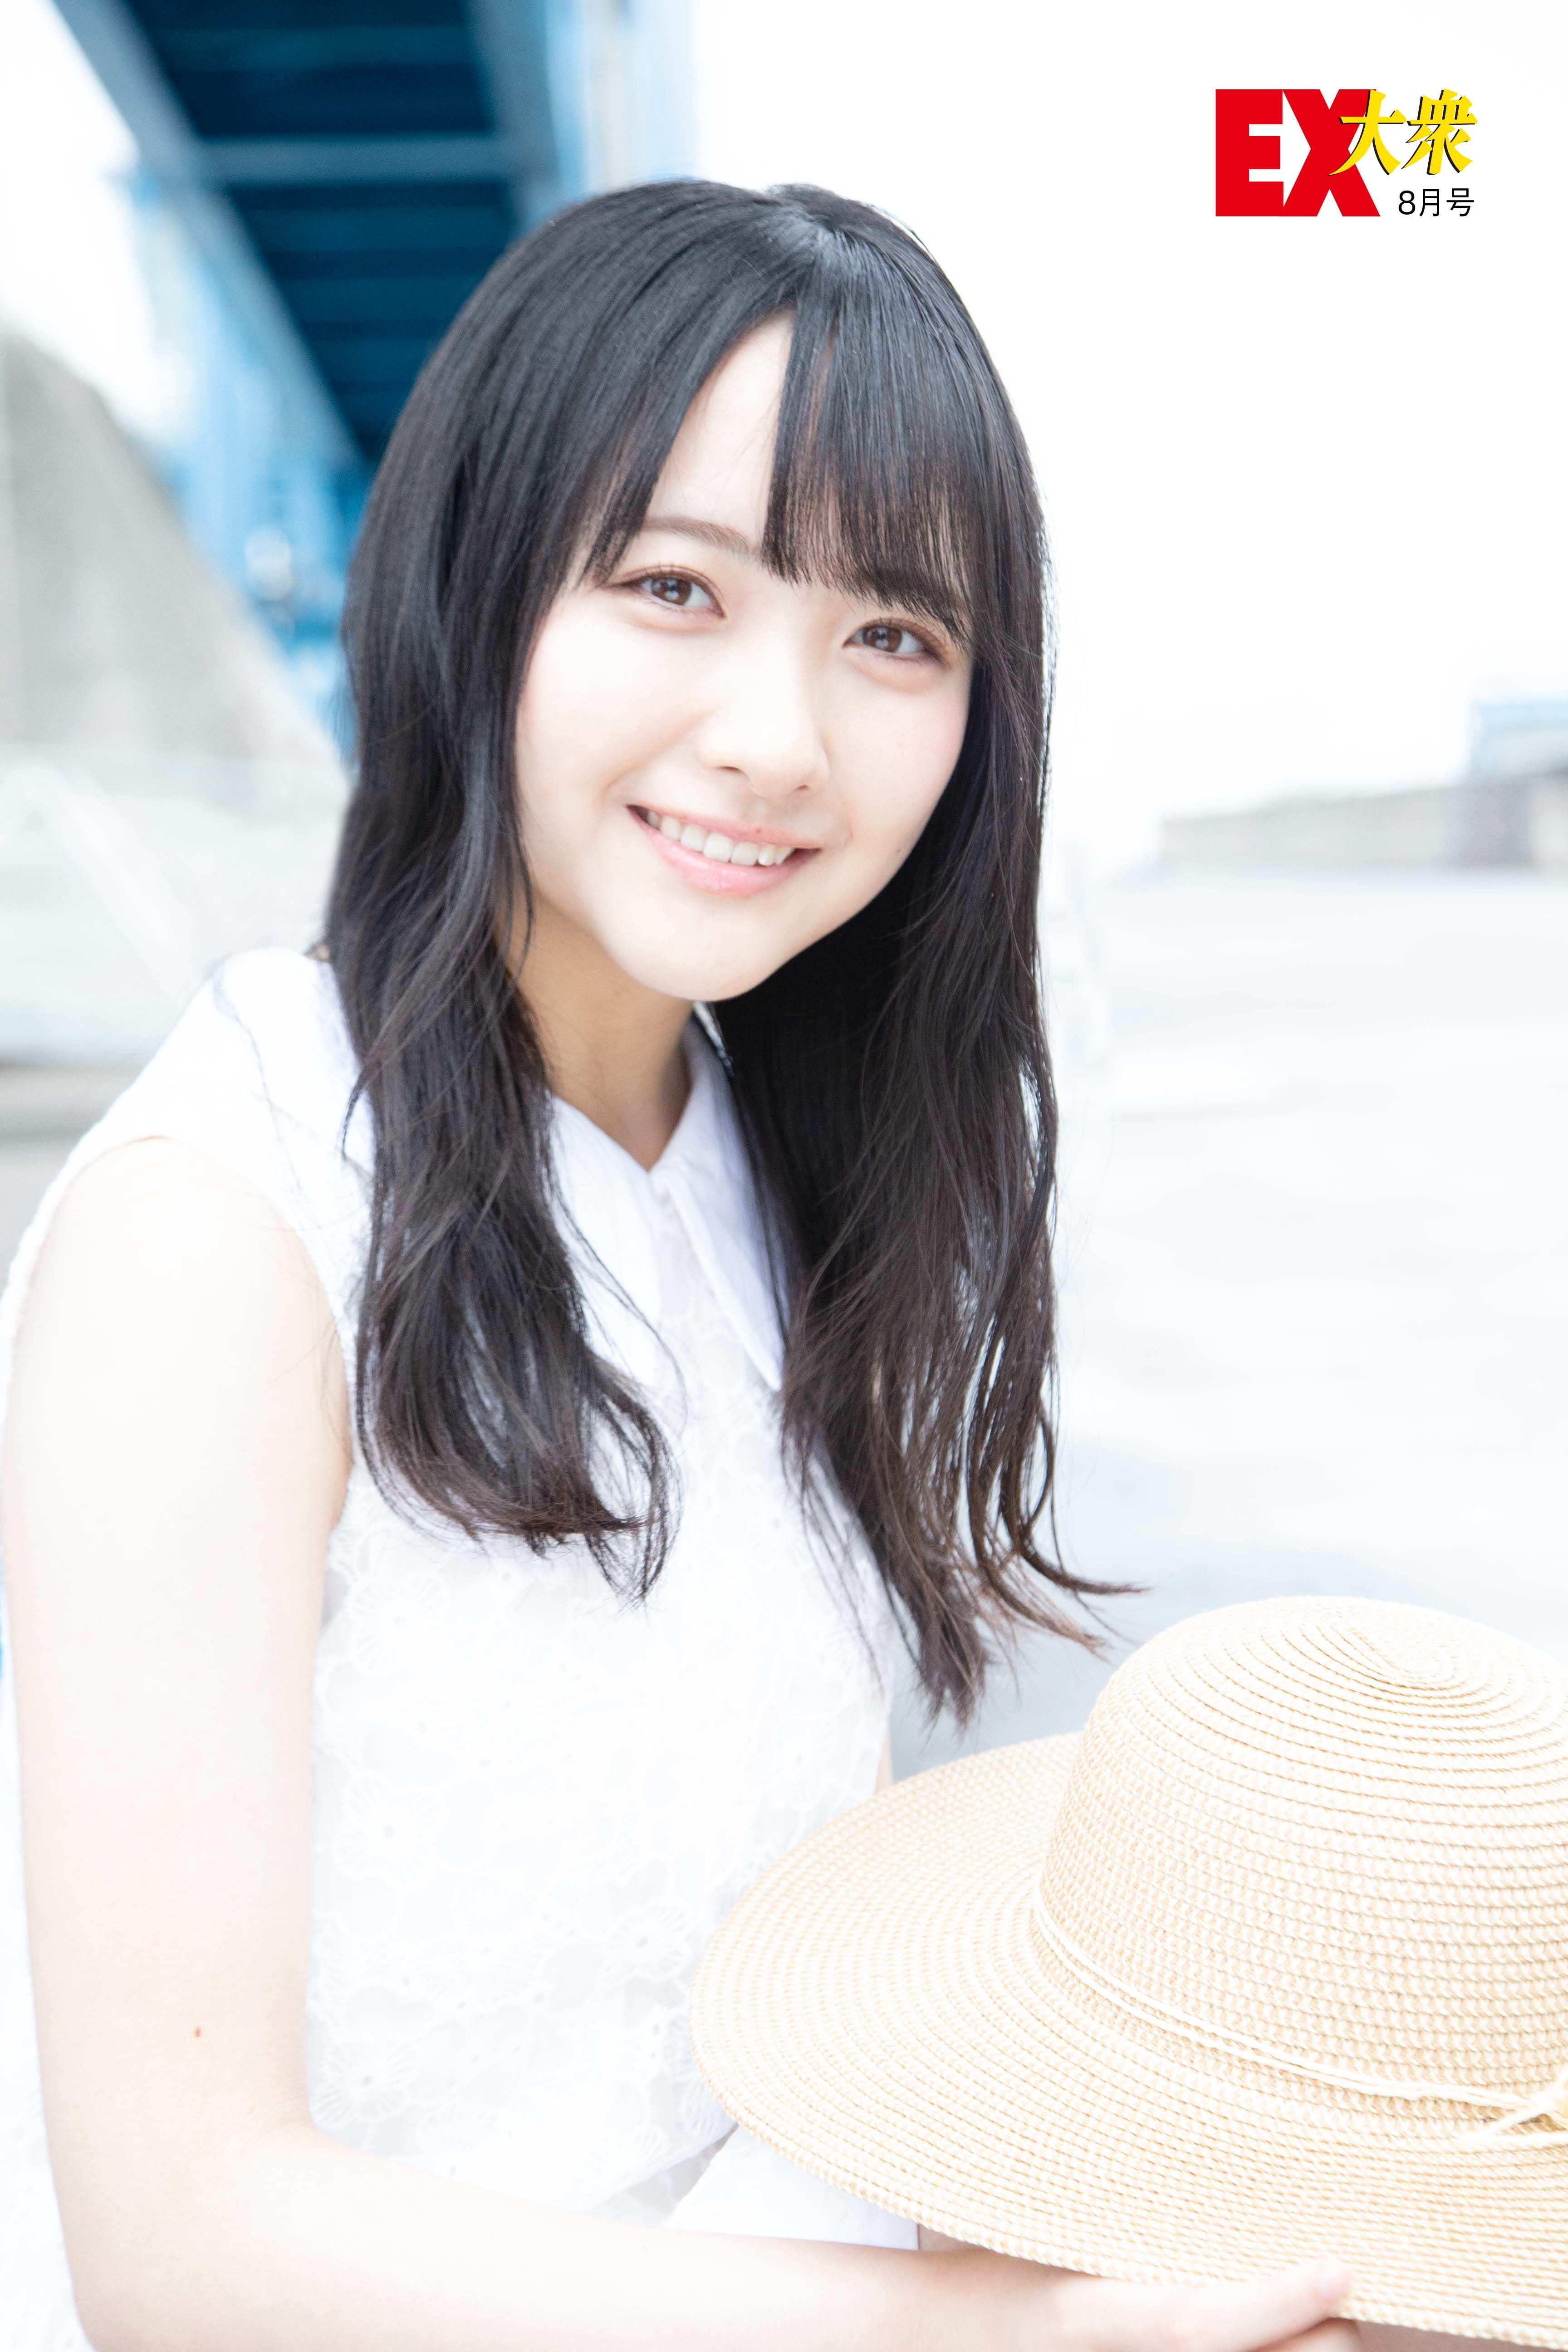 STU48石田千穂の本誌未掲載カット3枚を大公開!【EX大衆8月号】の画像001